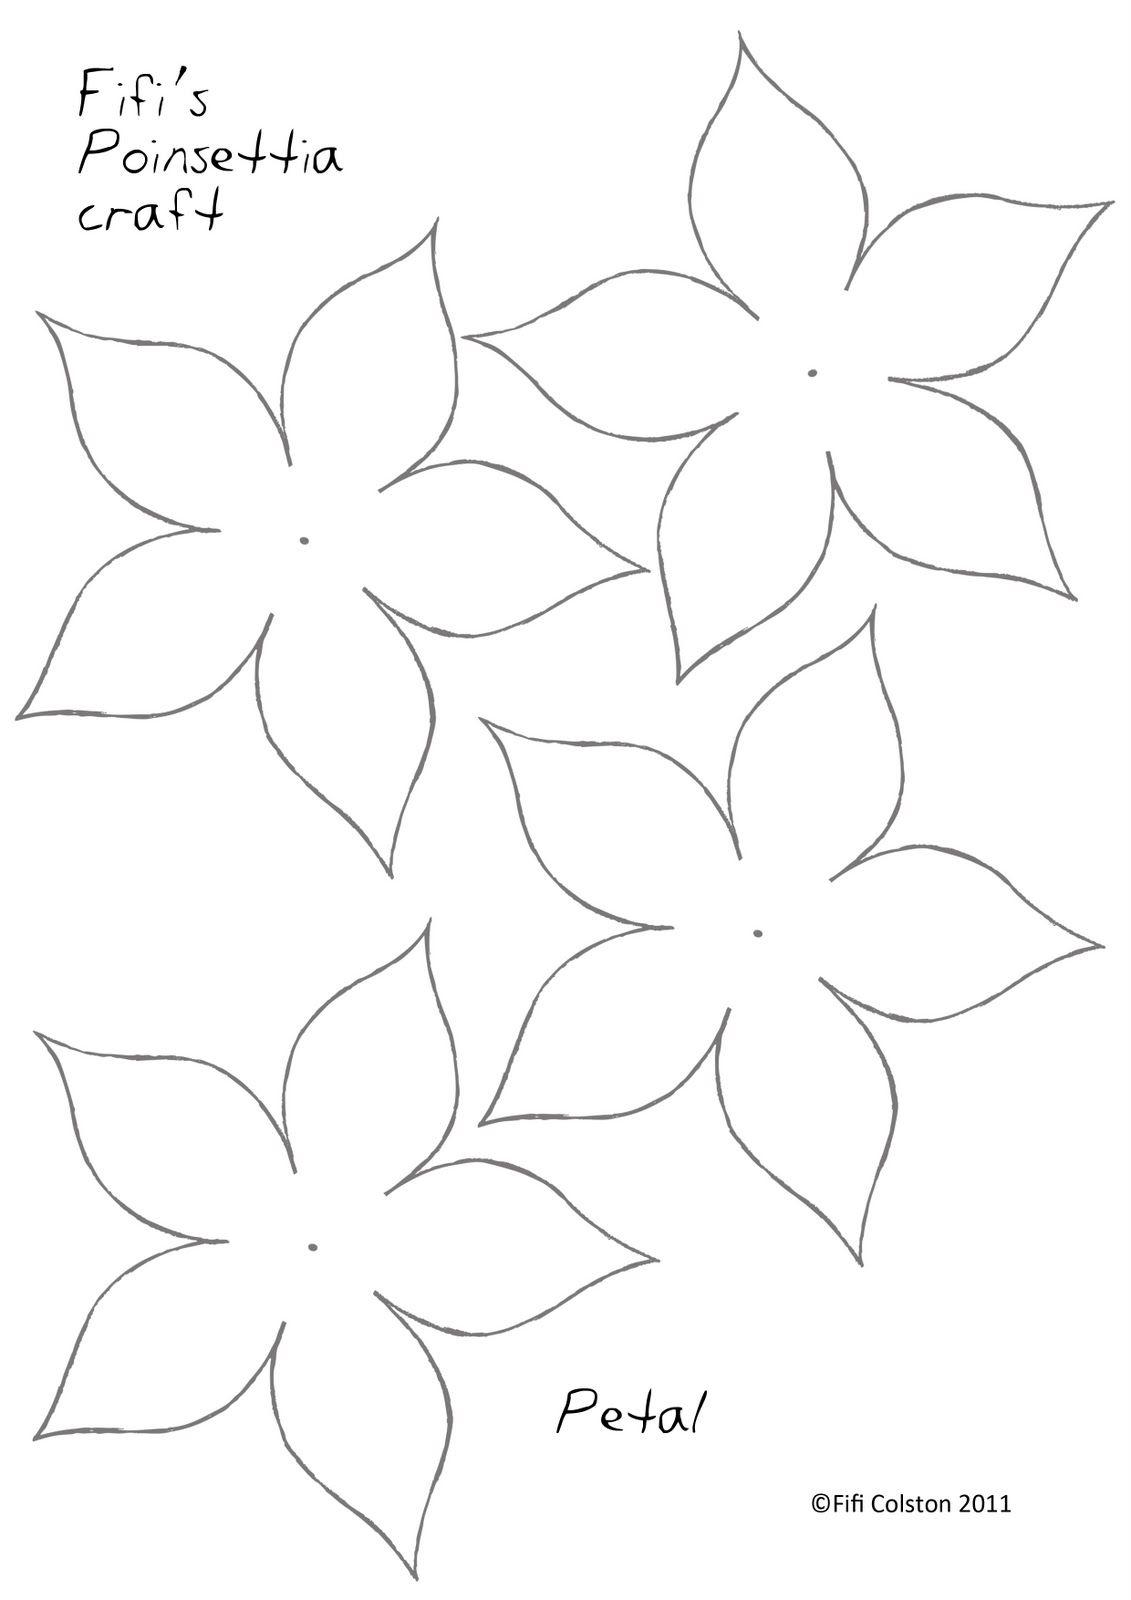 Poinsettia Paper Flower Template … | Paper Flowers | Paper… - 5 Petal Flower Template Free Printable